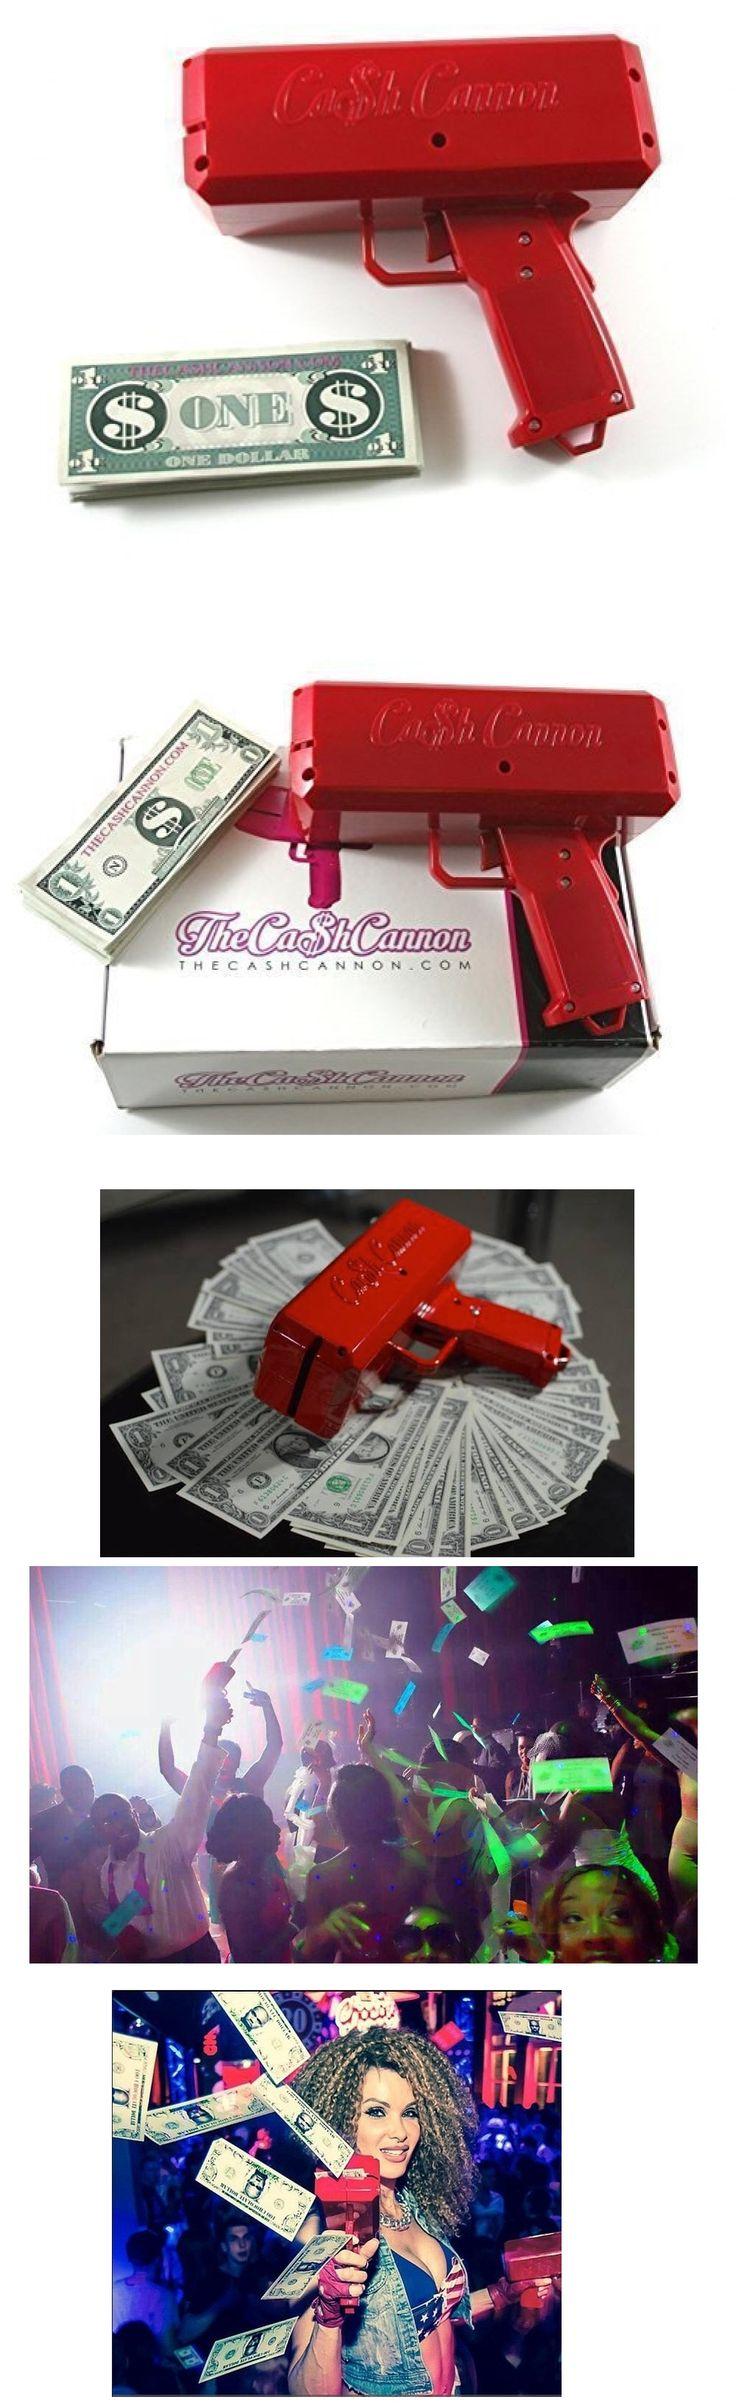 Strip Club Cash Cannon